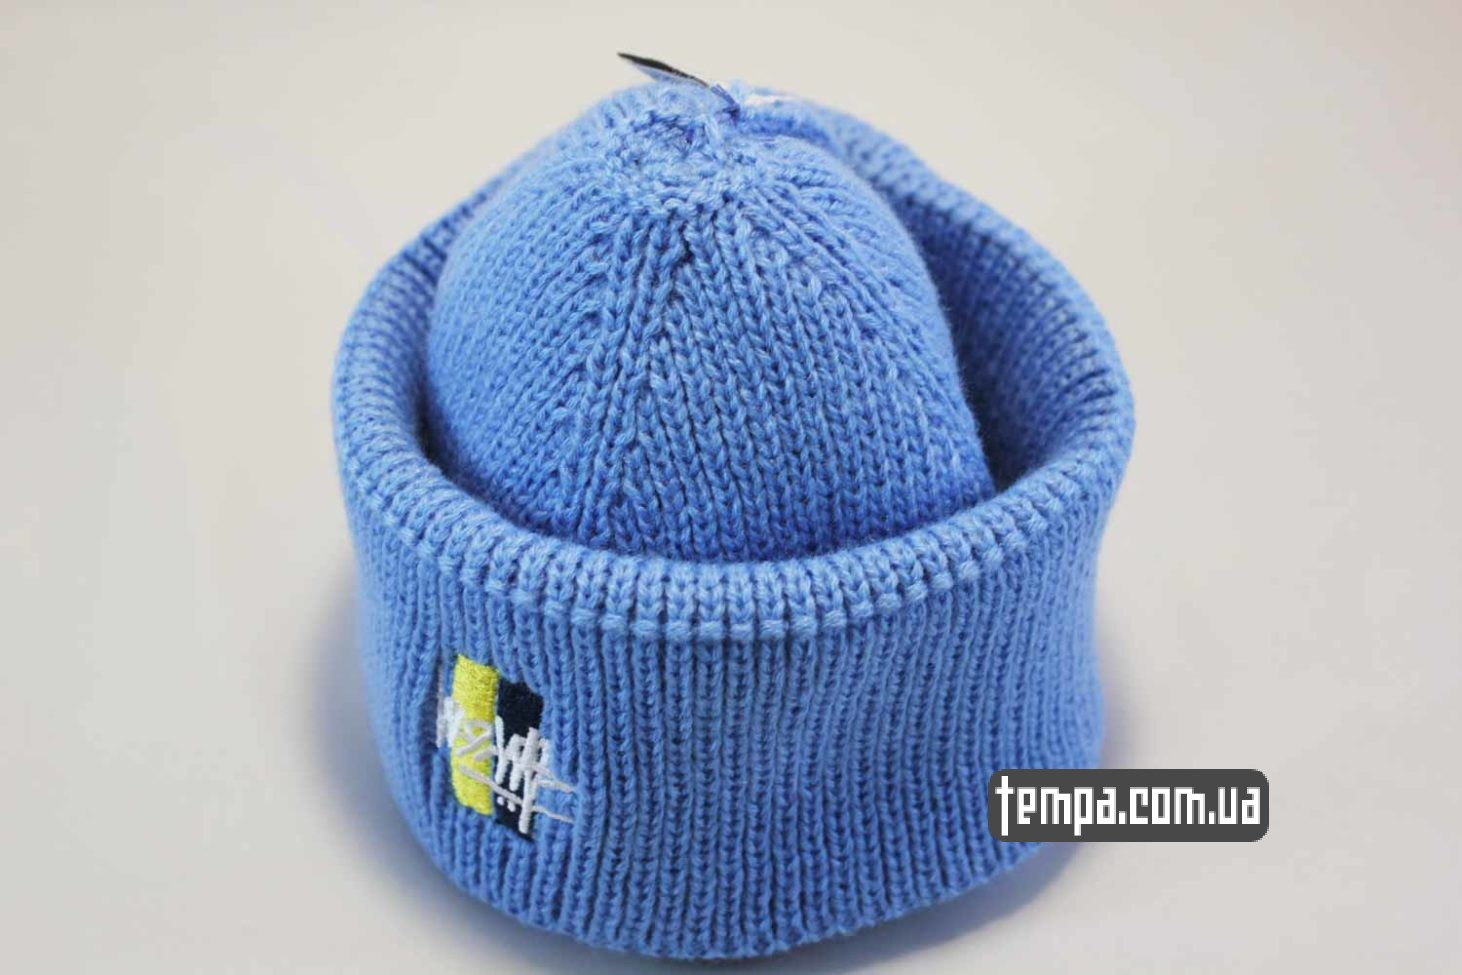 стасси украина купить шапка beanie STUSSY Ukraine edition синяя с украинским флагом